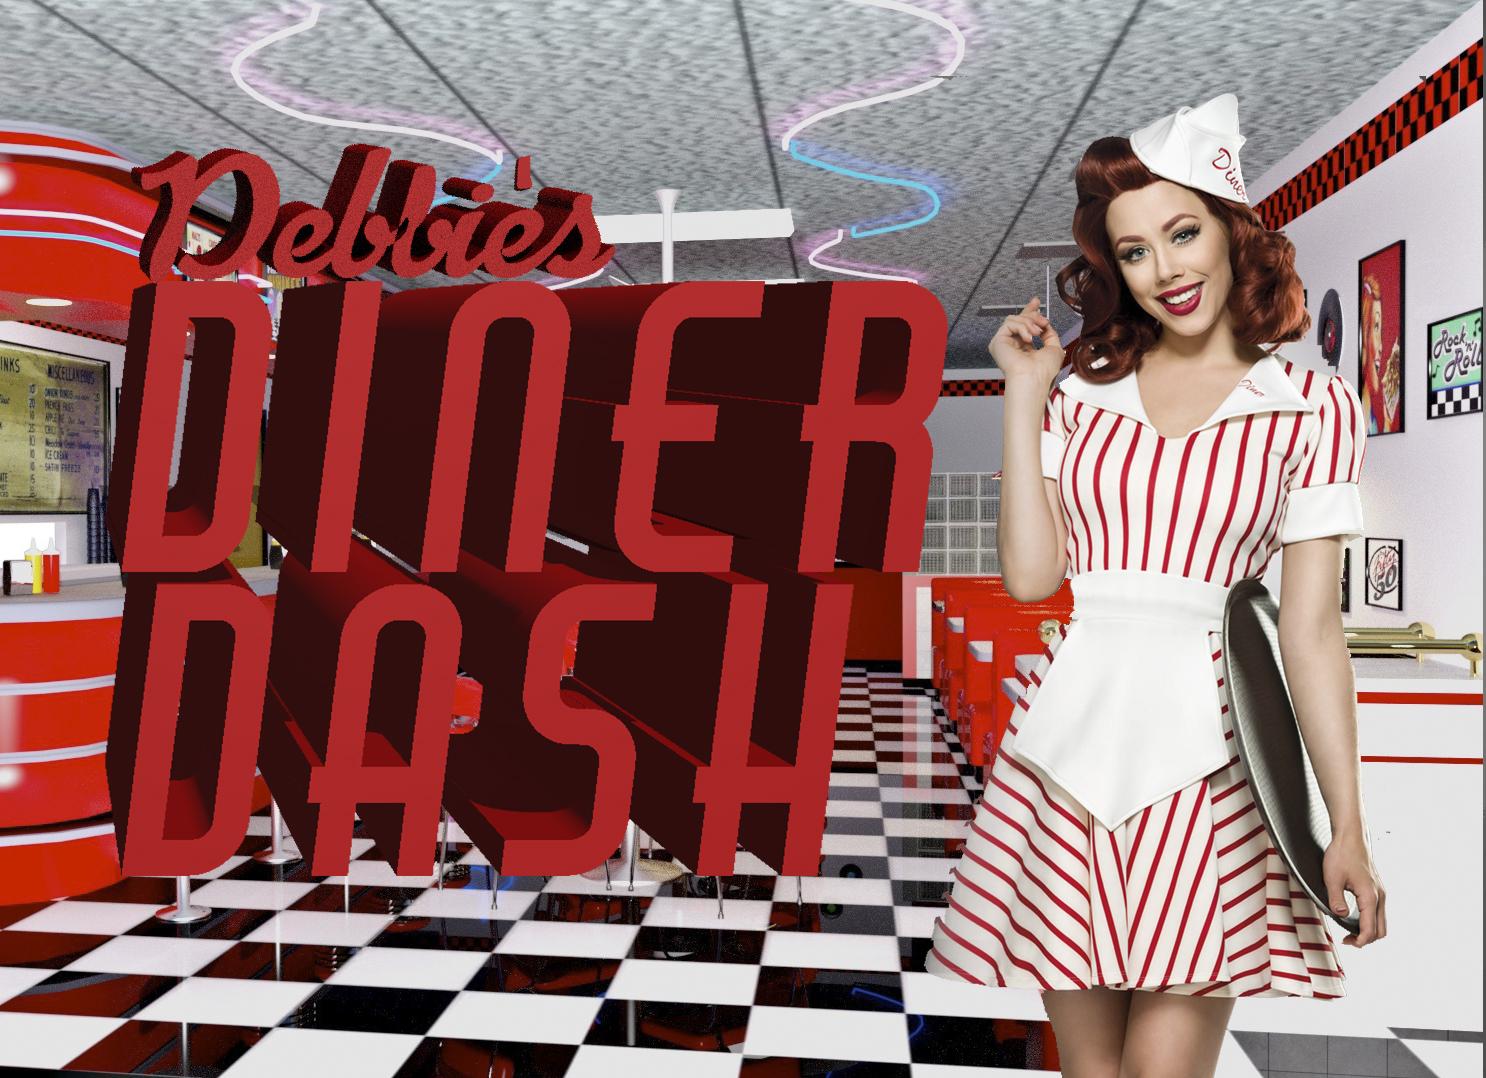 Debbies Diner Dash.jpg